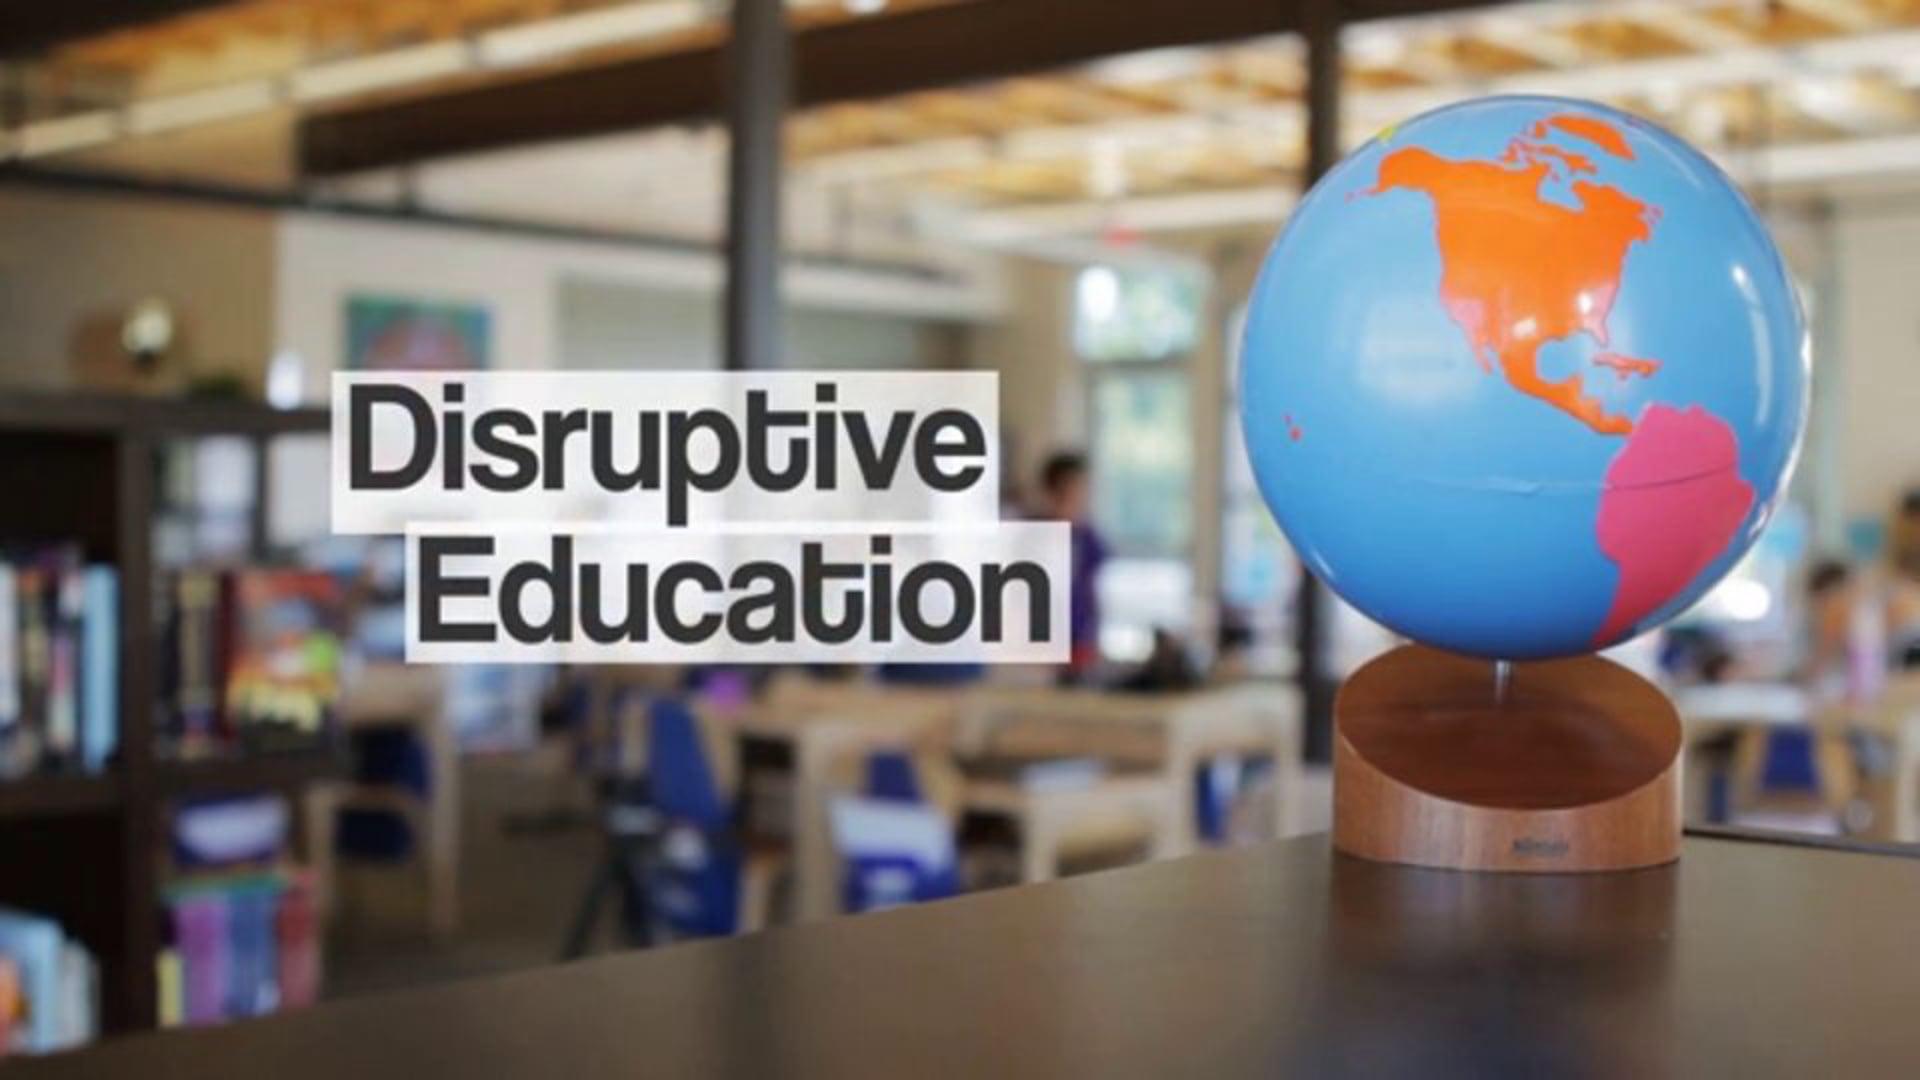 Disruptive Education